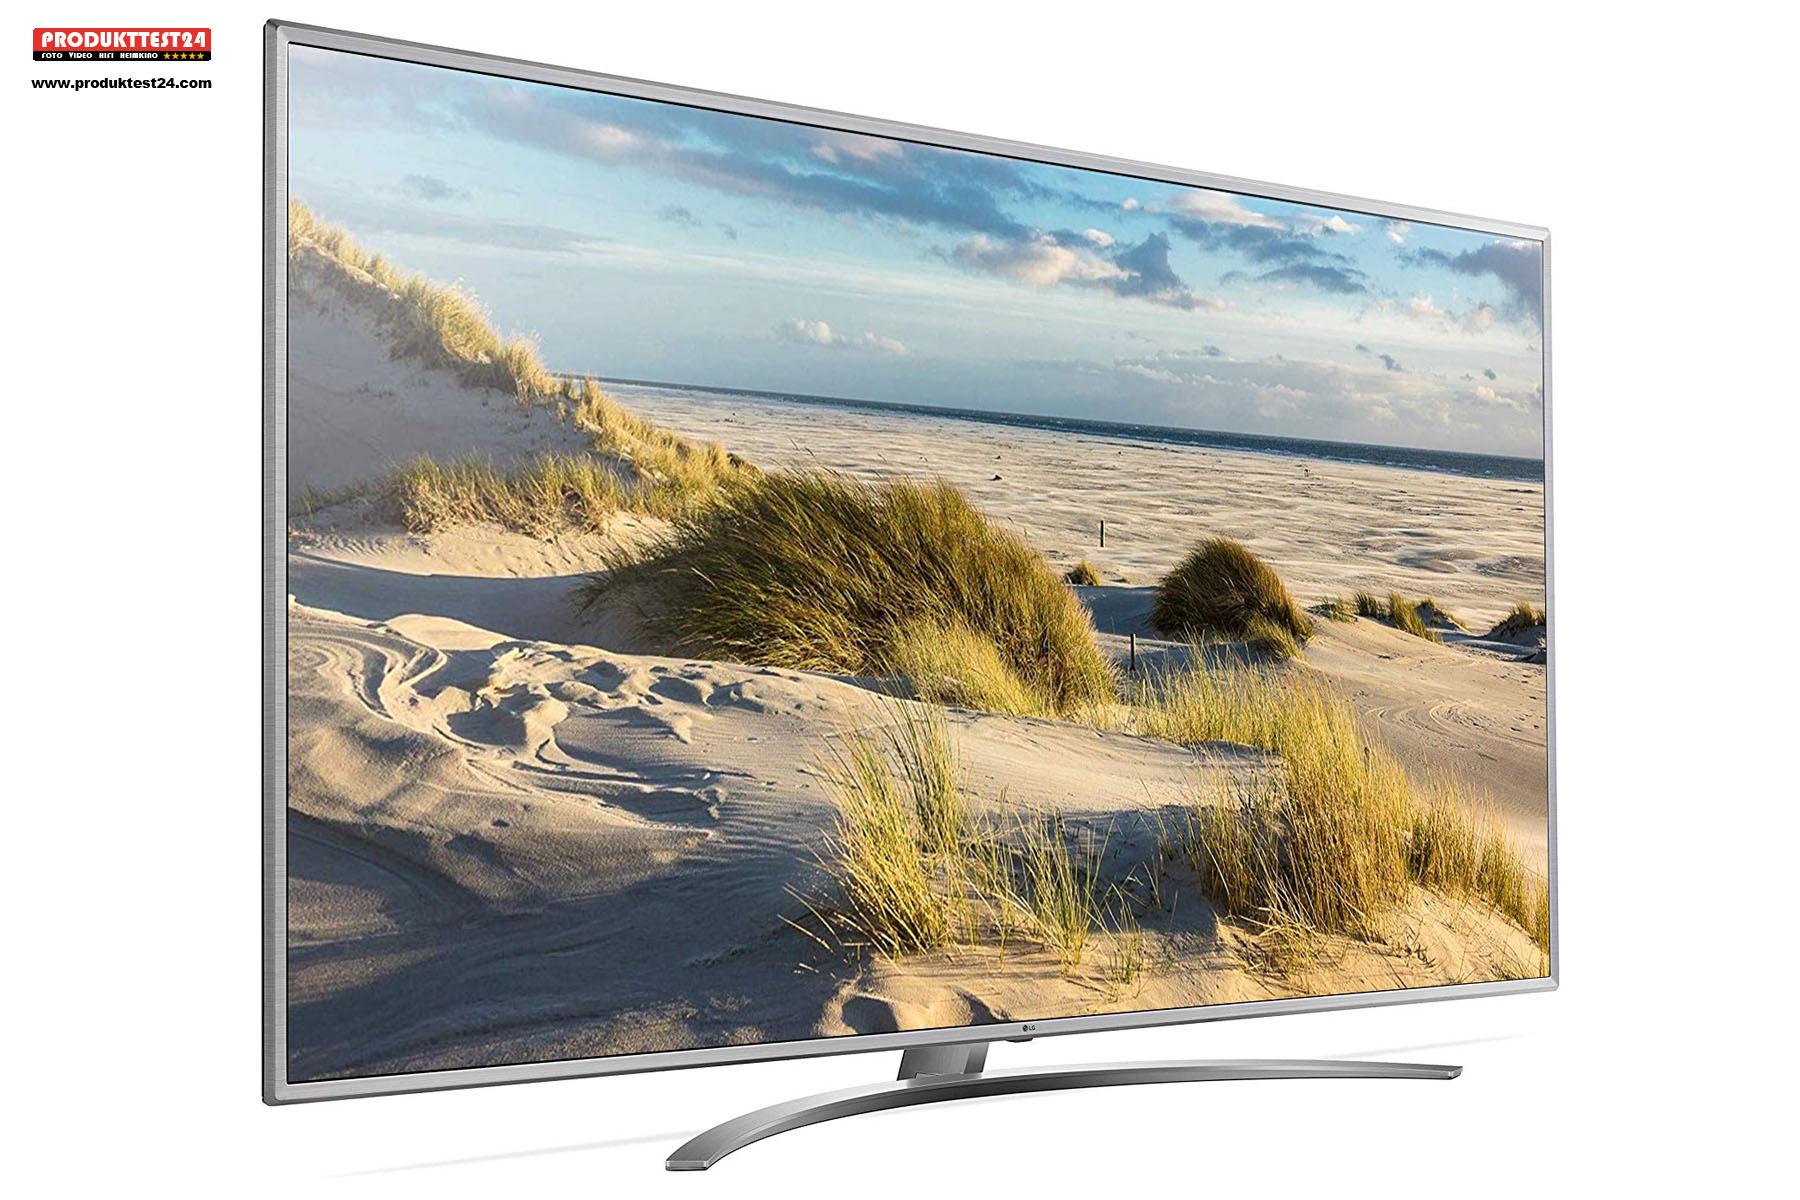 Der LG 75UM7600PLB Ultra HD 4K-Fernseher